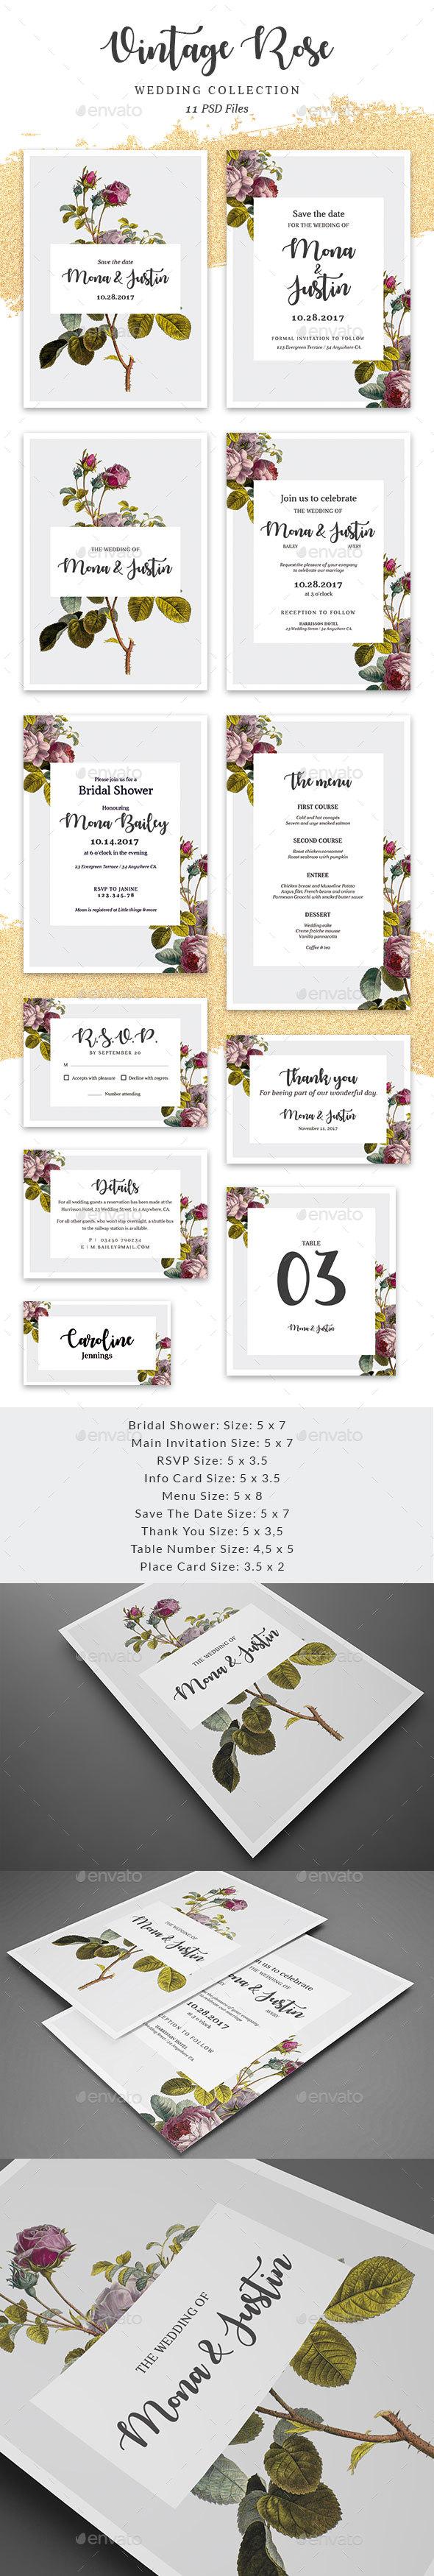 GraphicRiver Vintage Rose Wedding collection 20309097